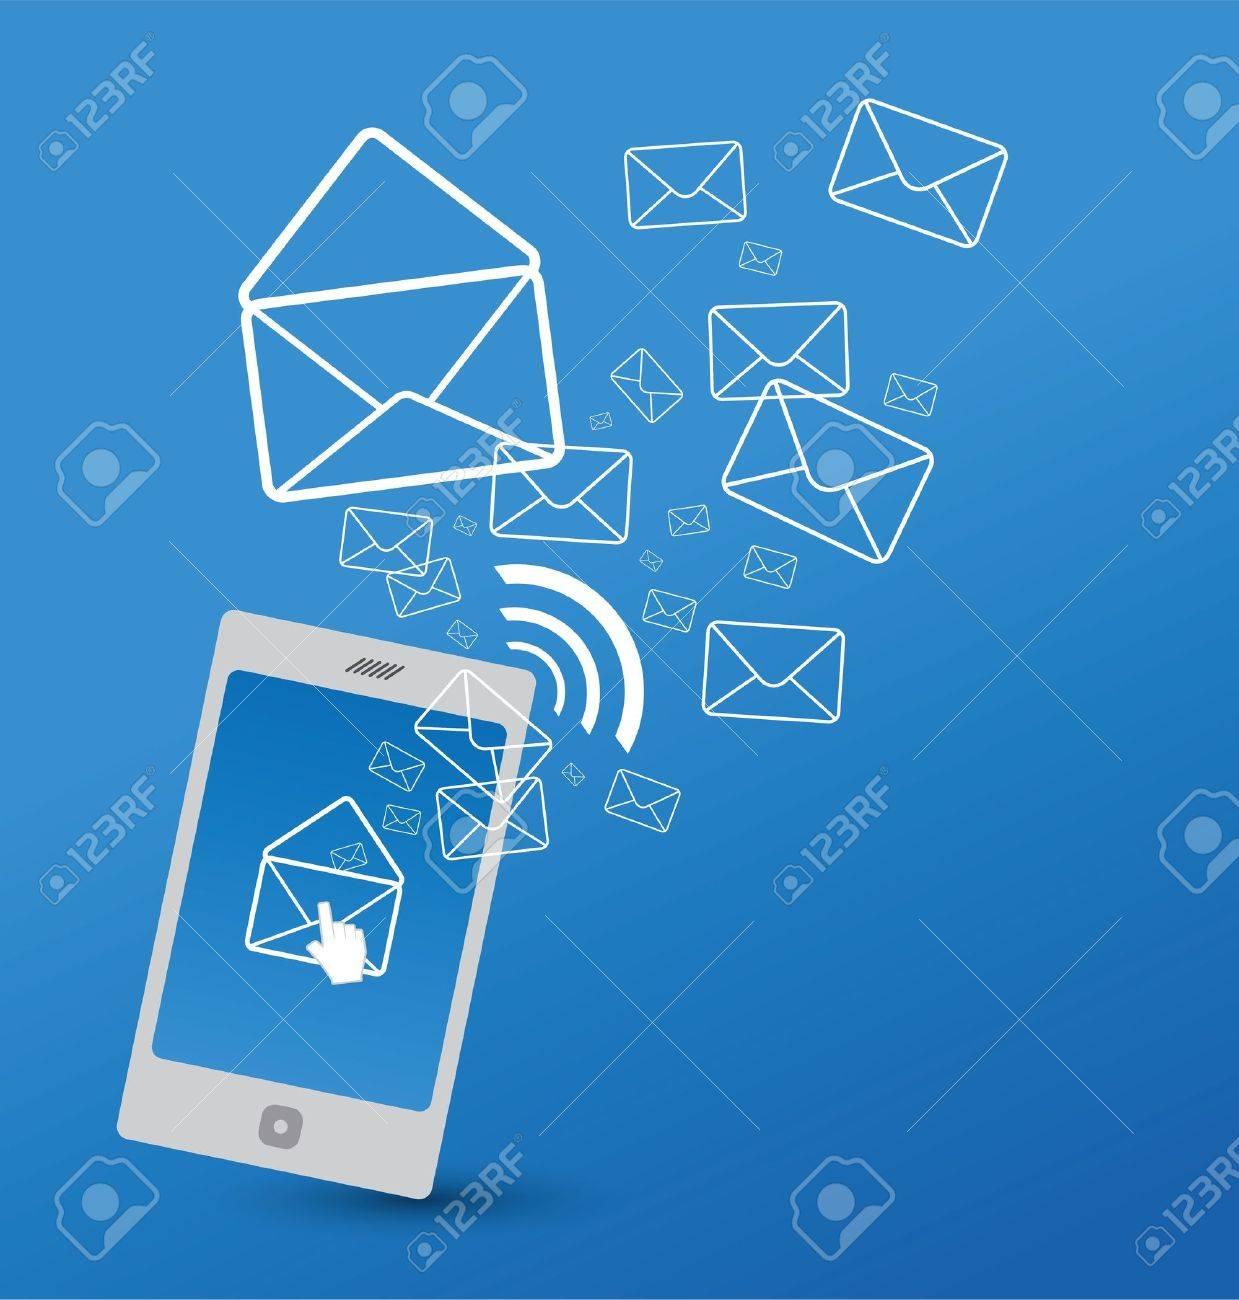 Sending SMS Stock Vector - 19450211